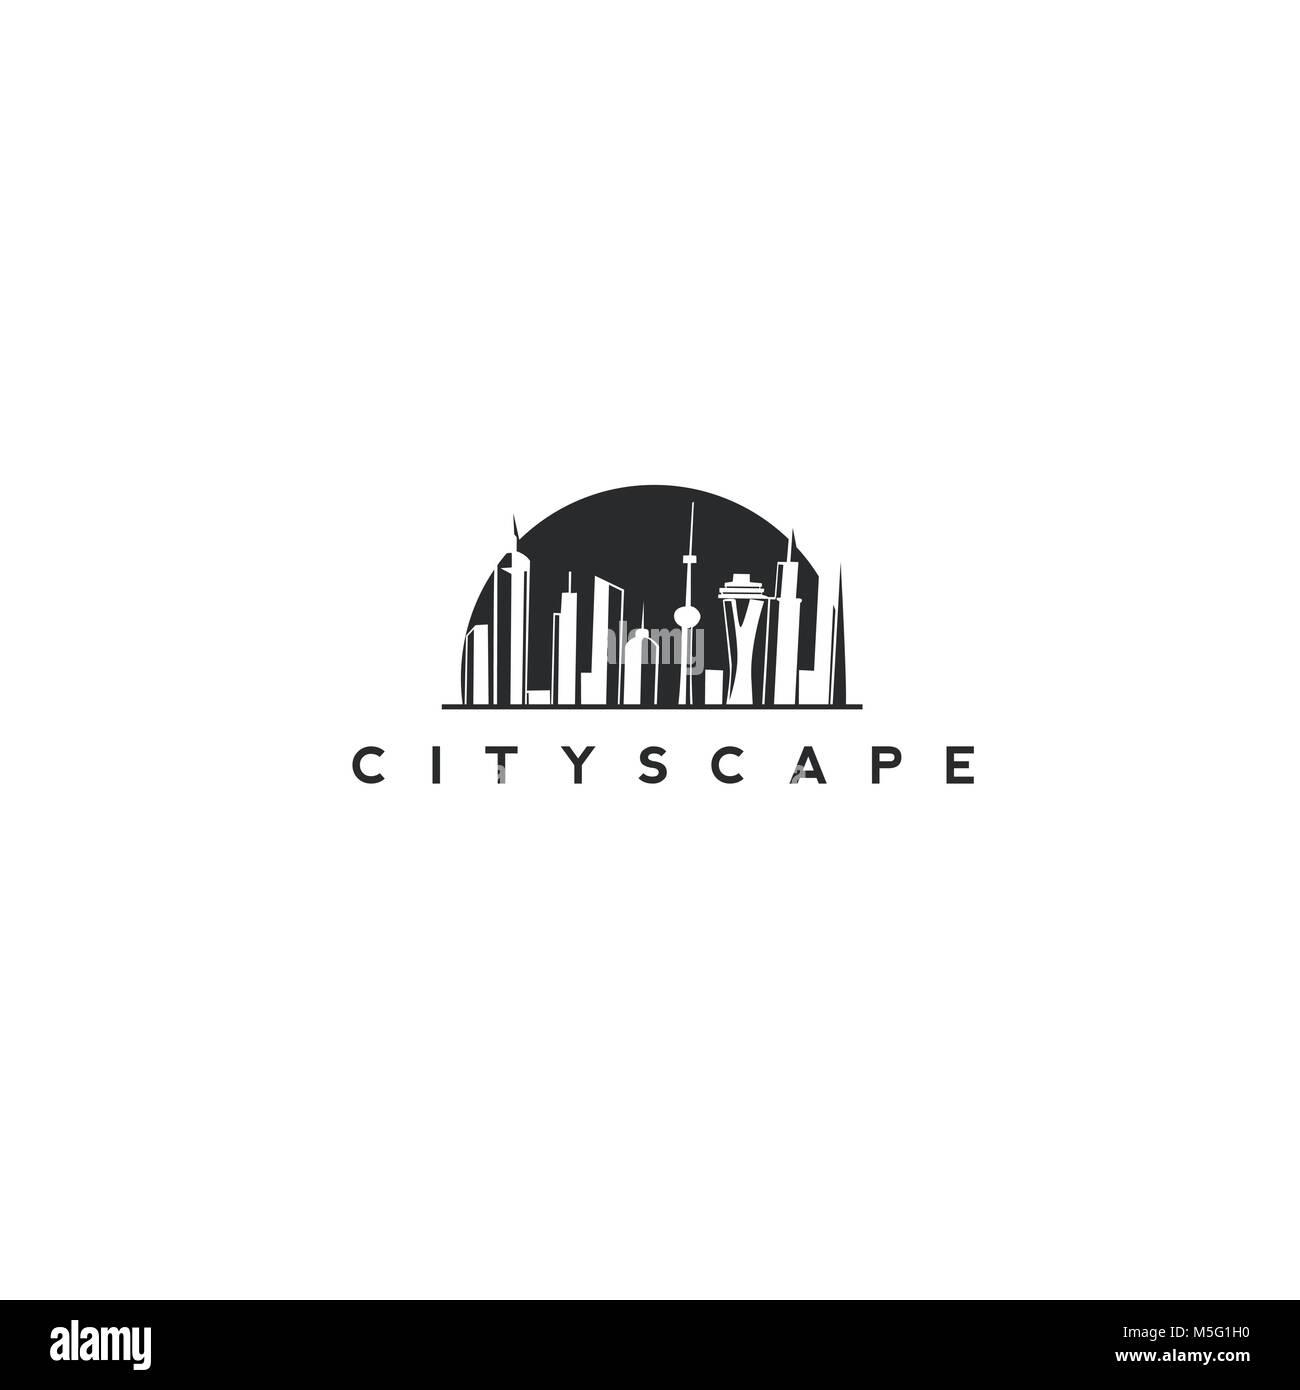 Cityscape Building Line art Vector Illustration design - Stock Image